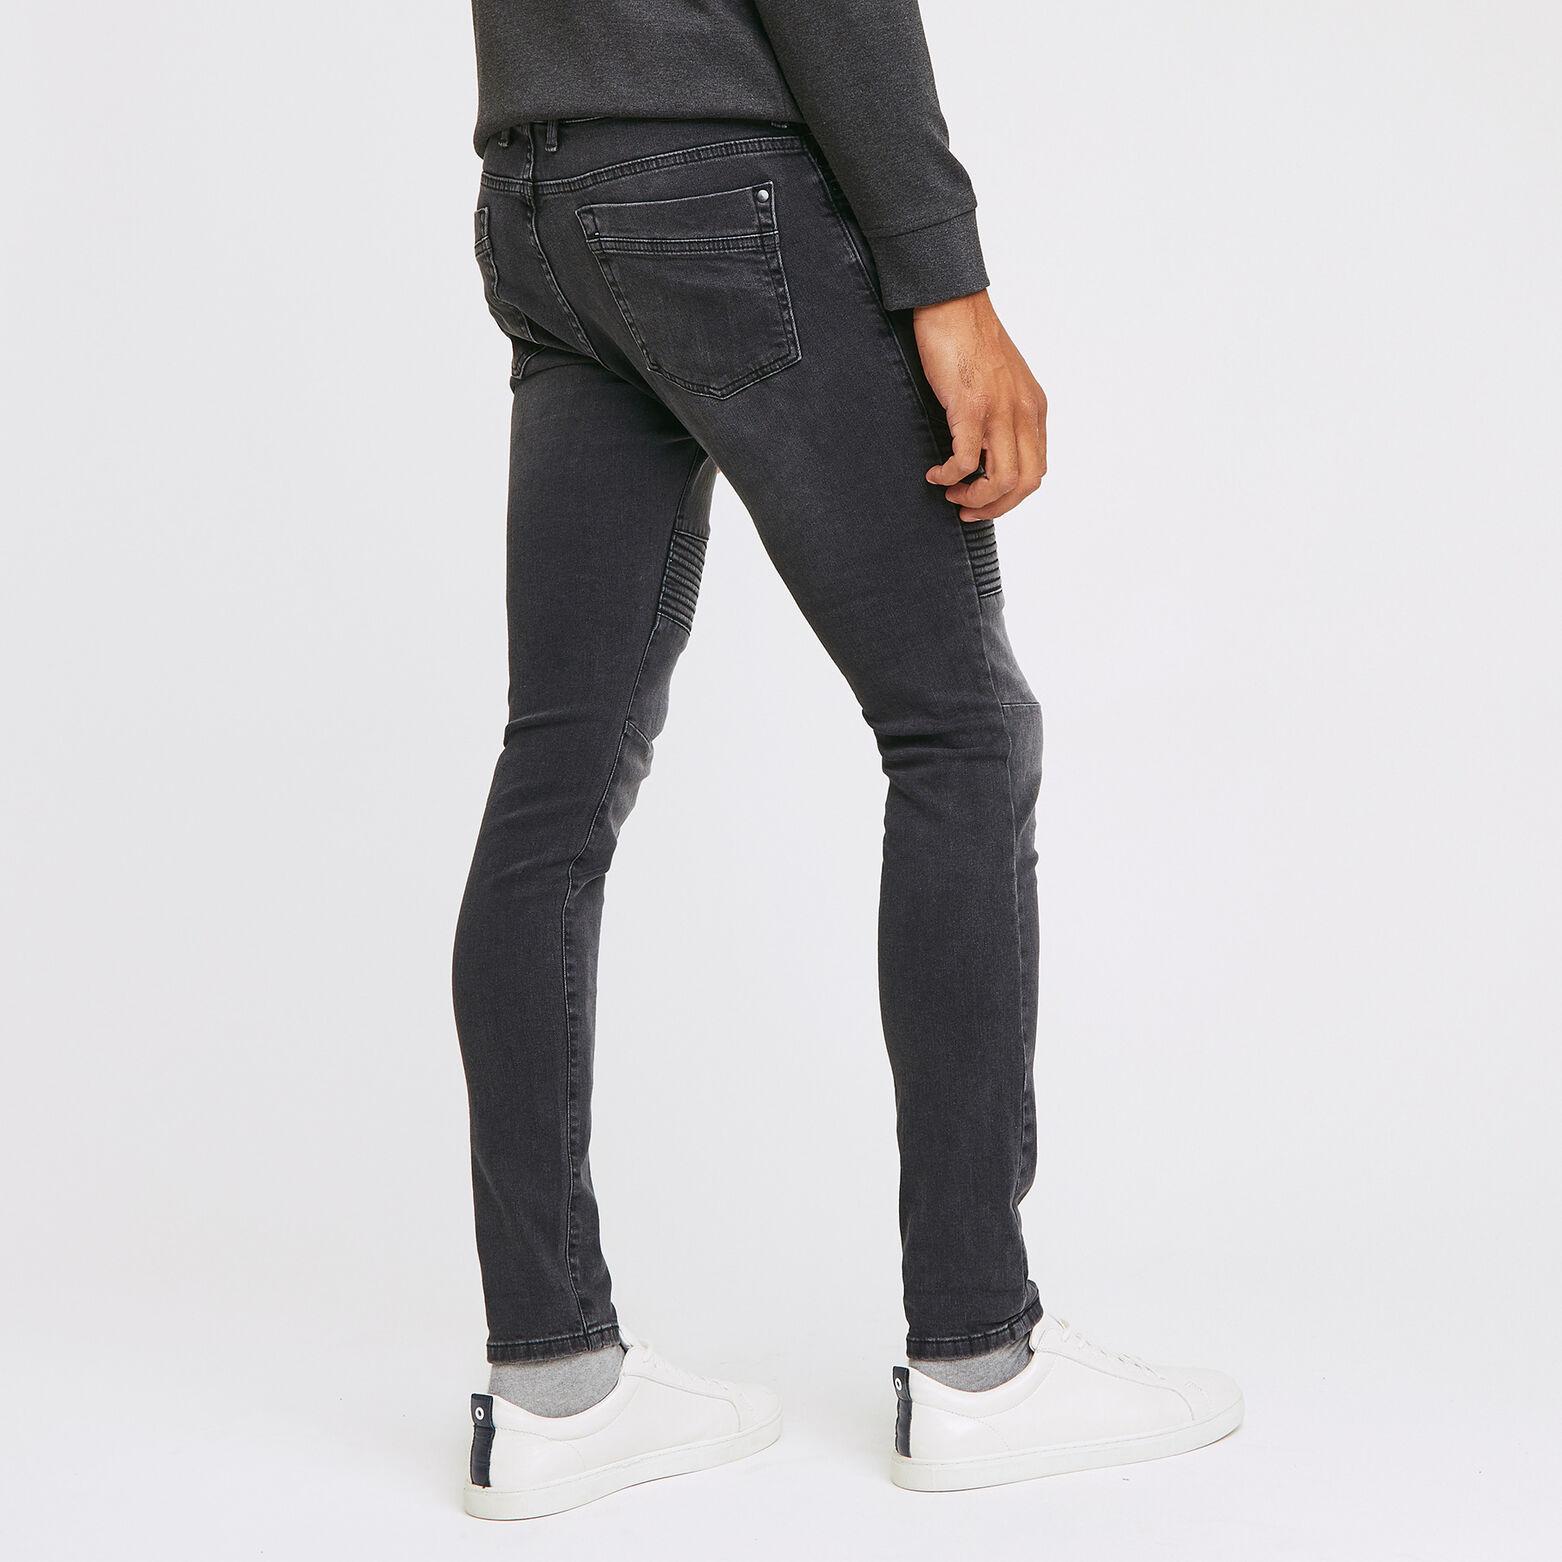 jean skinny #Max biker noir